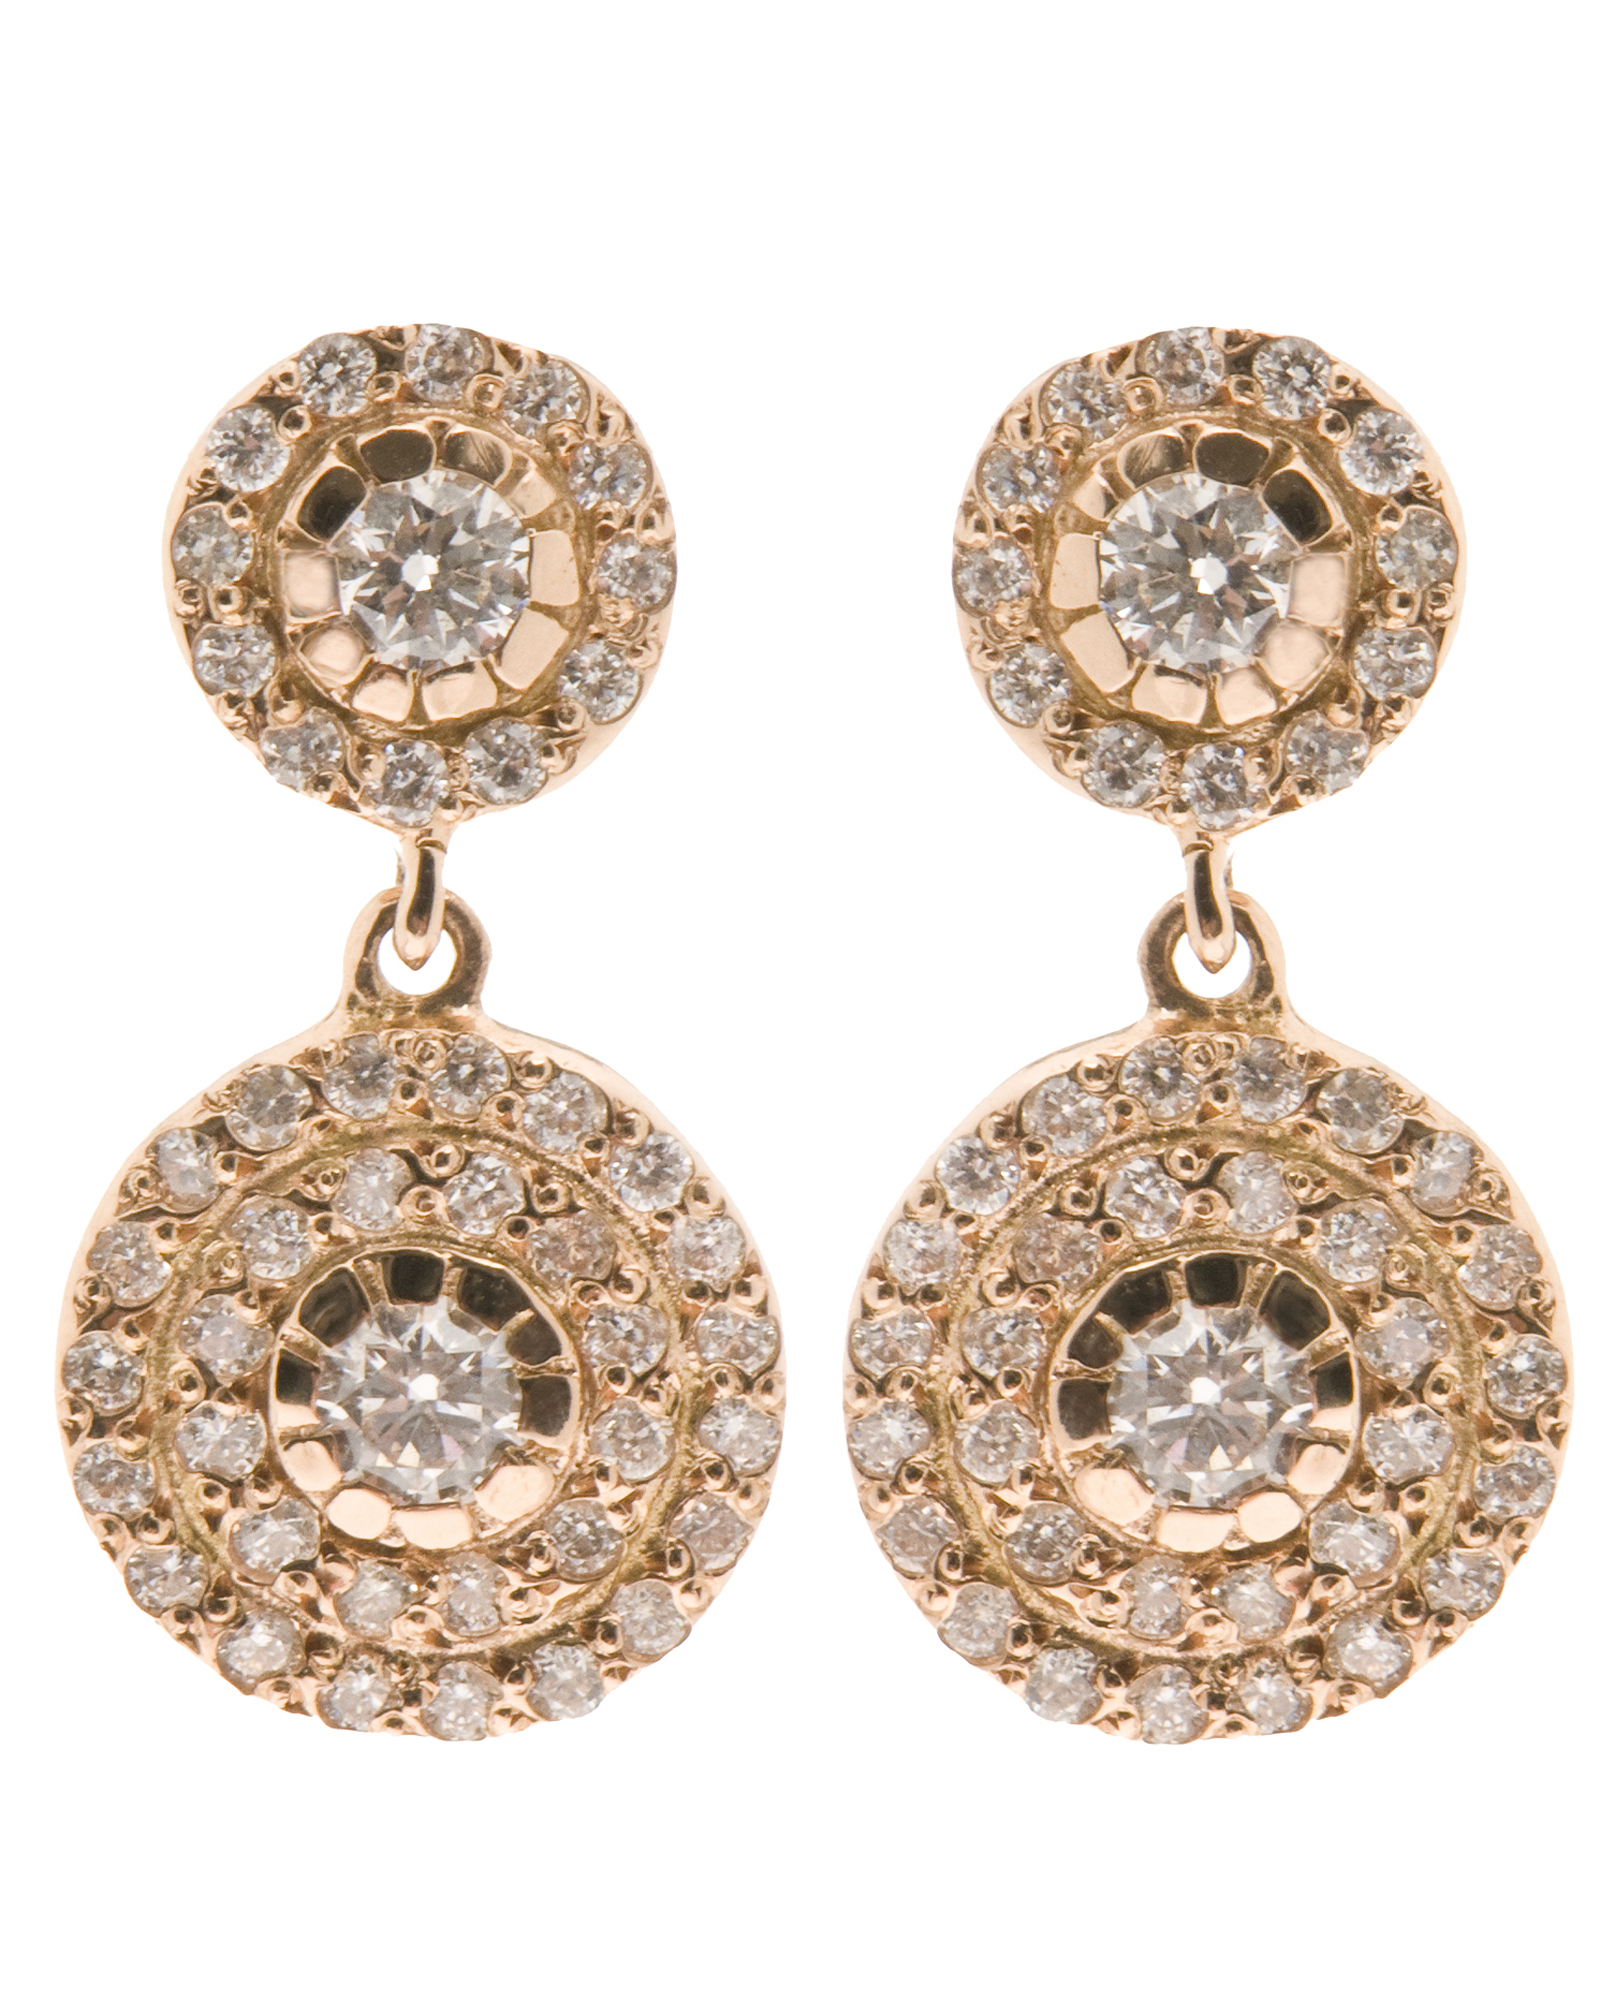 Ileana Makri Double Solitaire Earring in Metallics fpqvWJLP